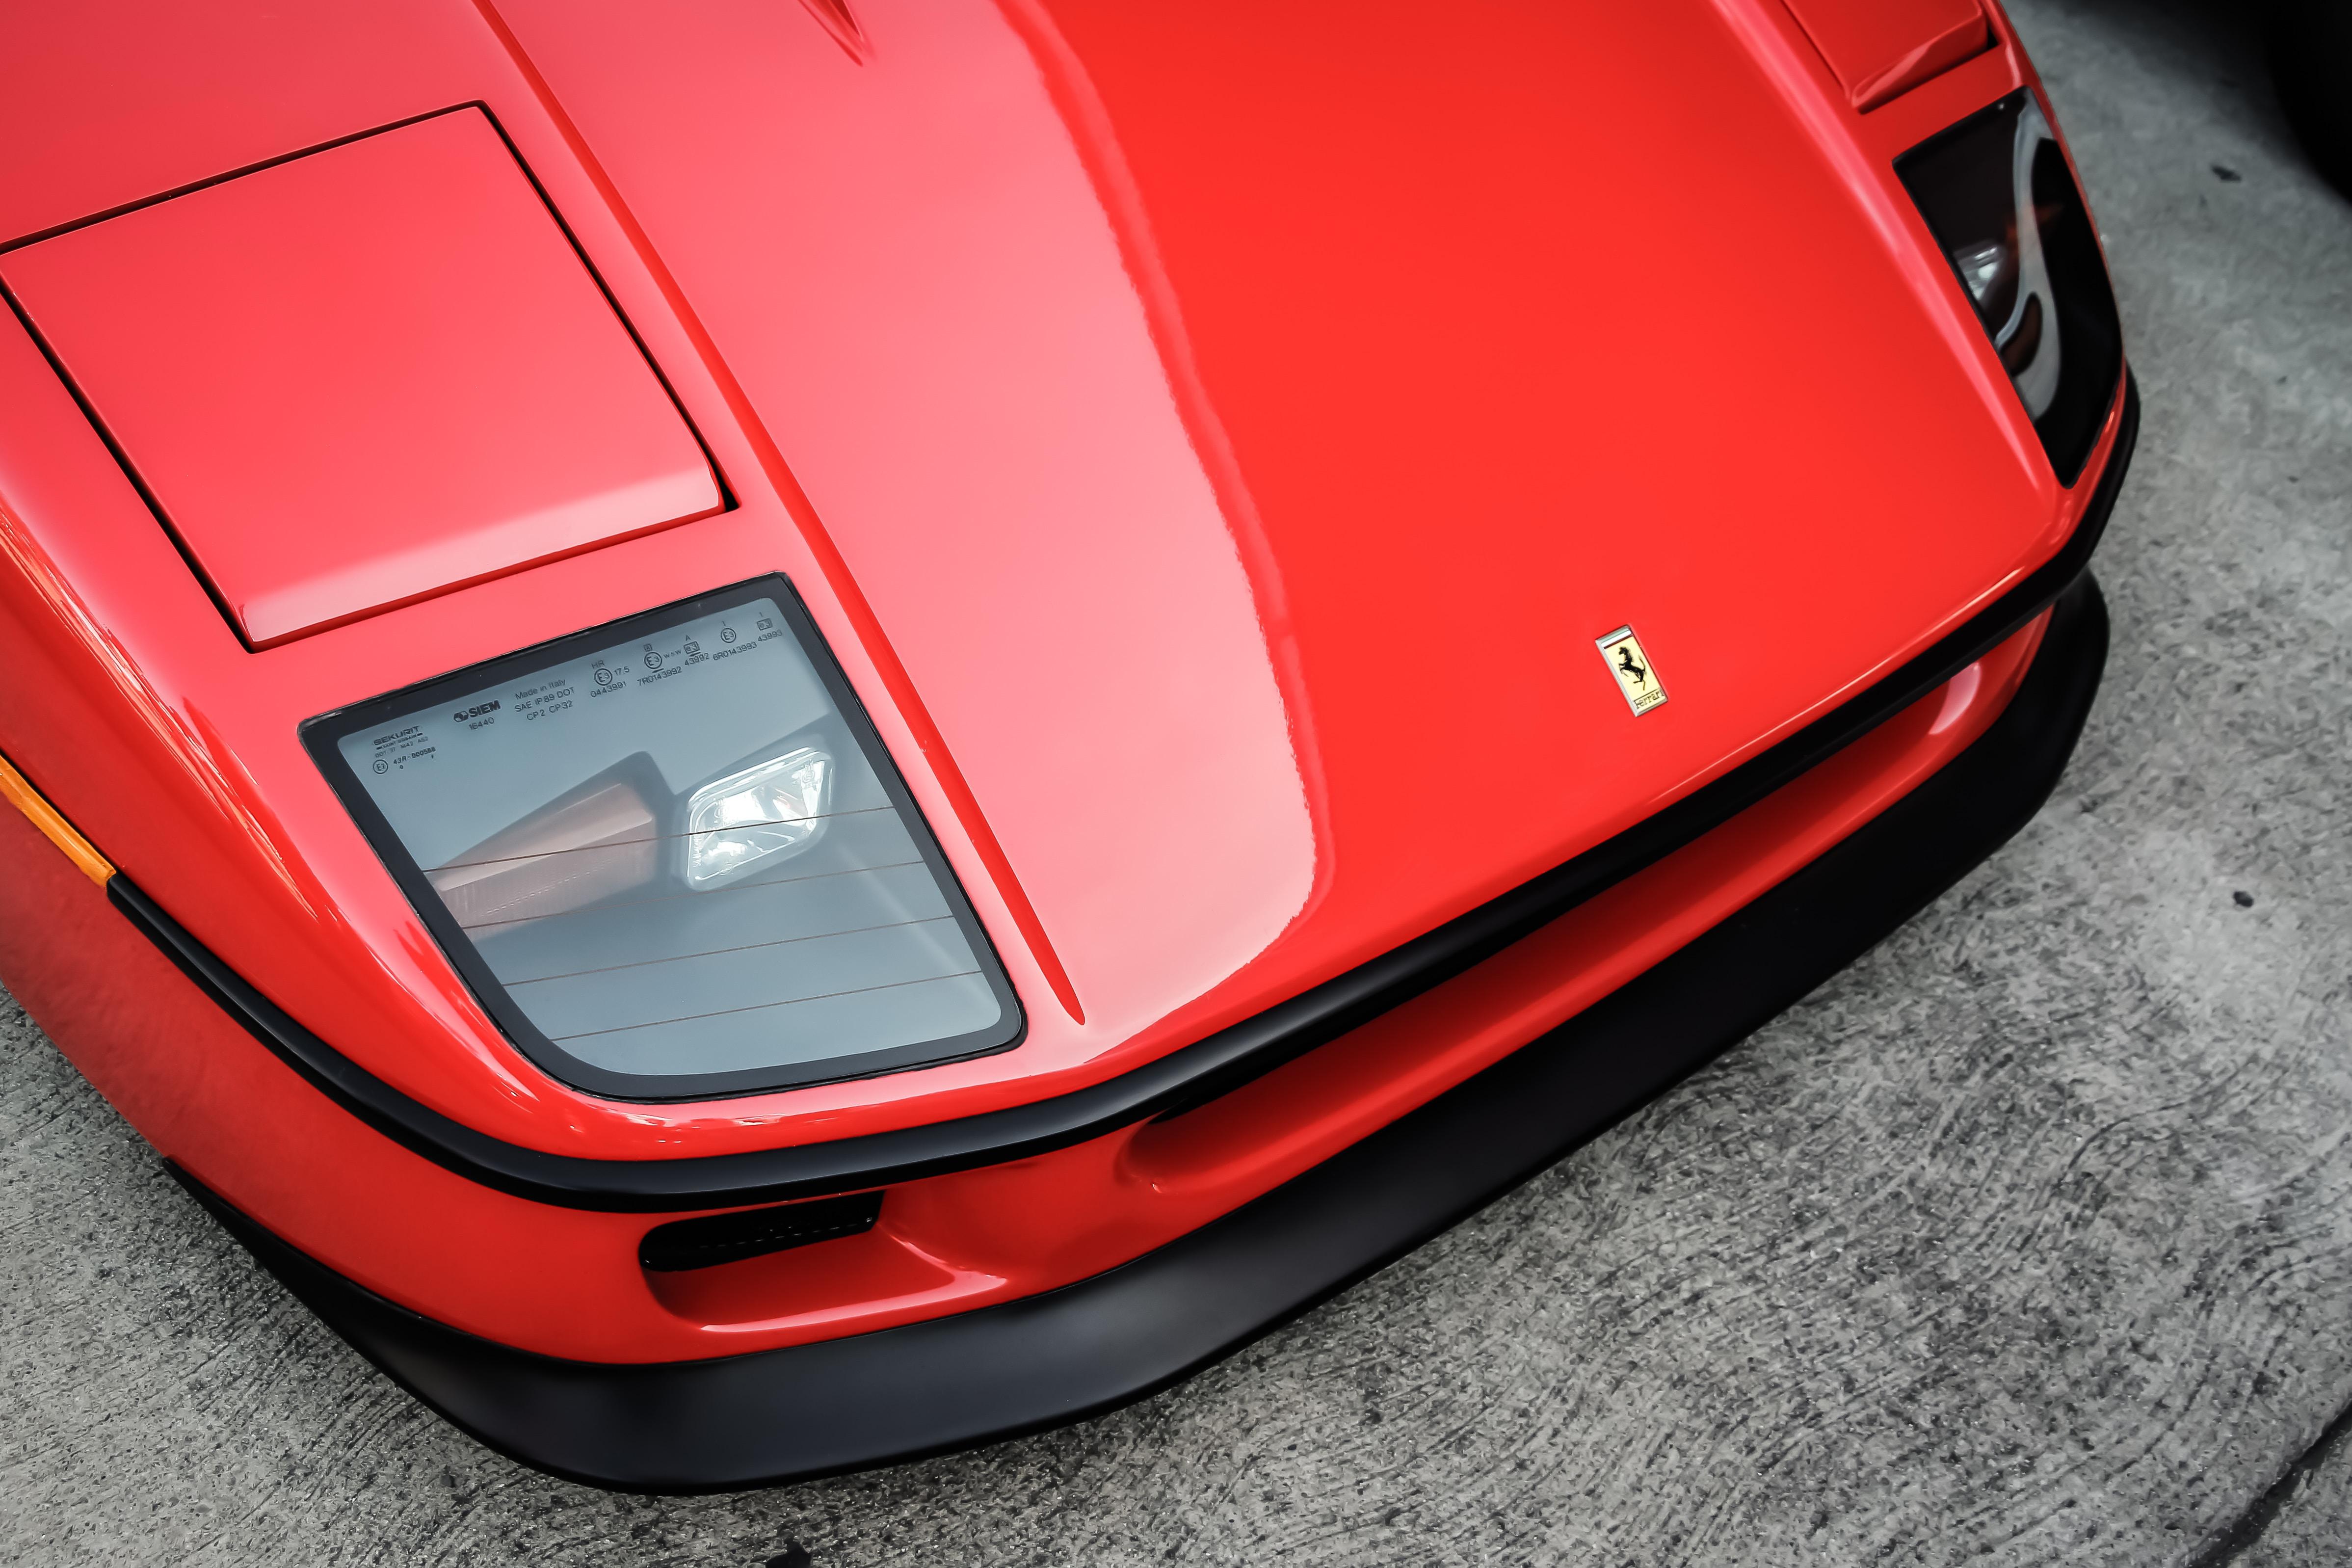 red Porsche car